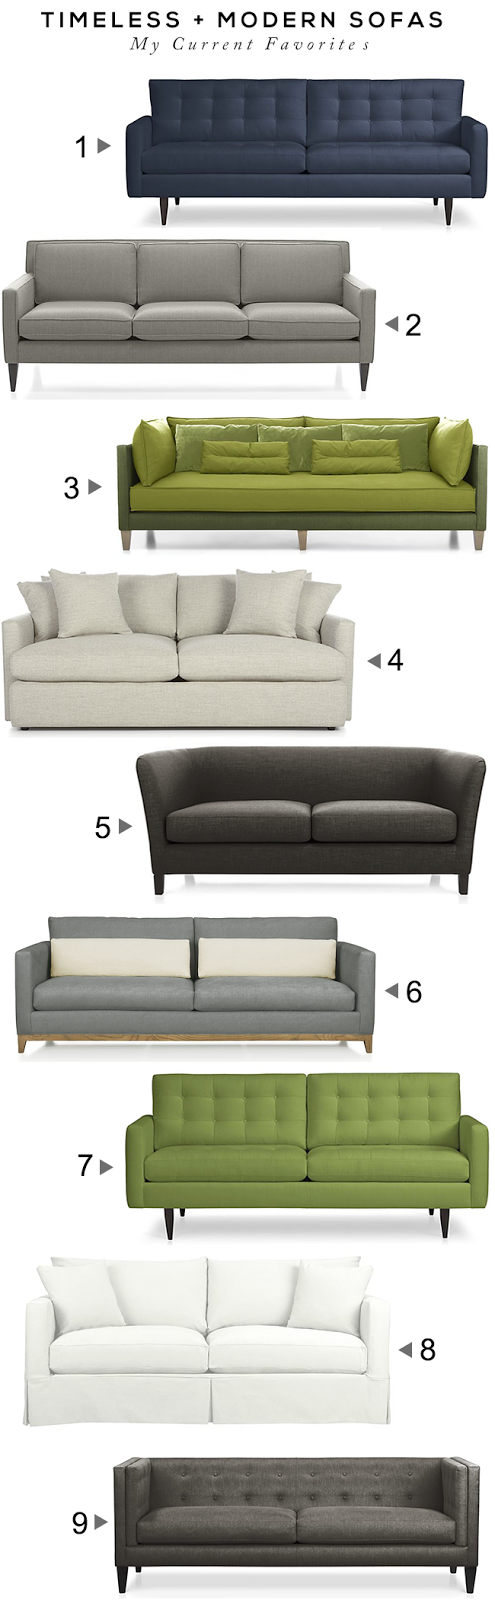 Sensational Modern Timeless Sofas Home And Interior Love Home Decor Ncnpc Chair Design For Home Ncnpcorg